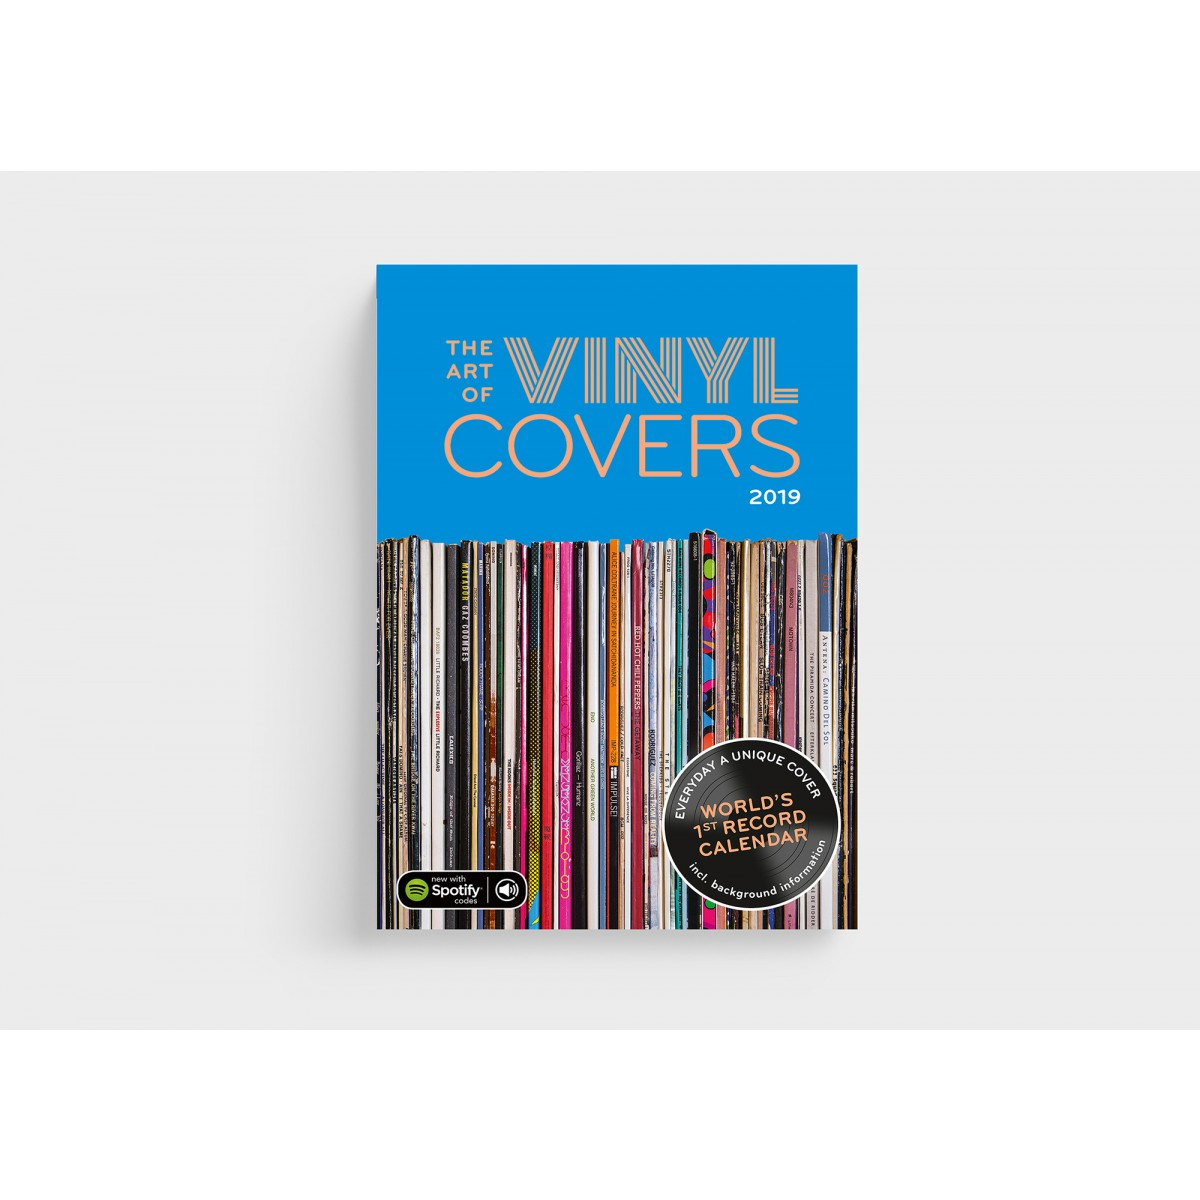 The Art of Vinyl Covers 2019